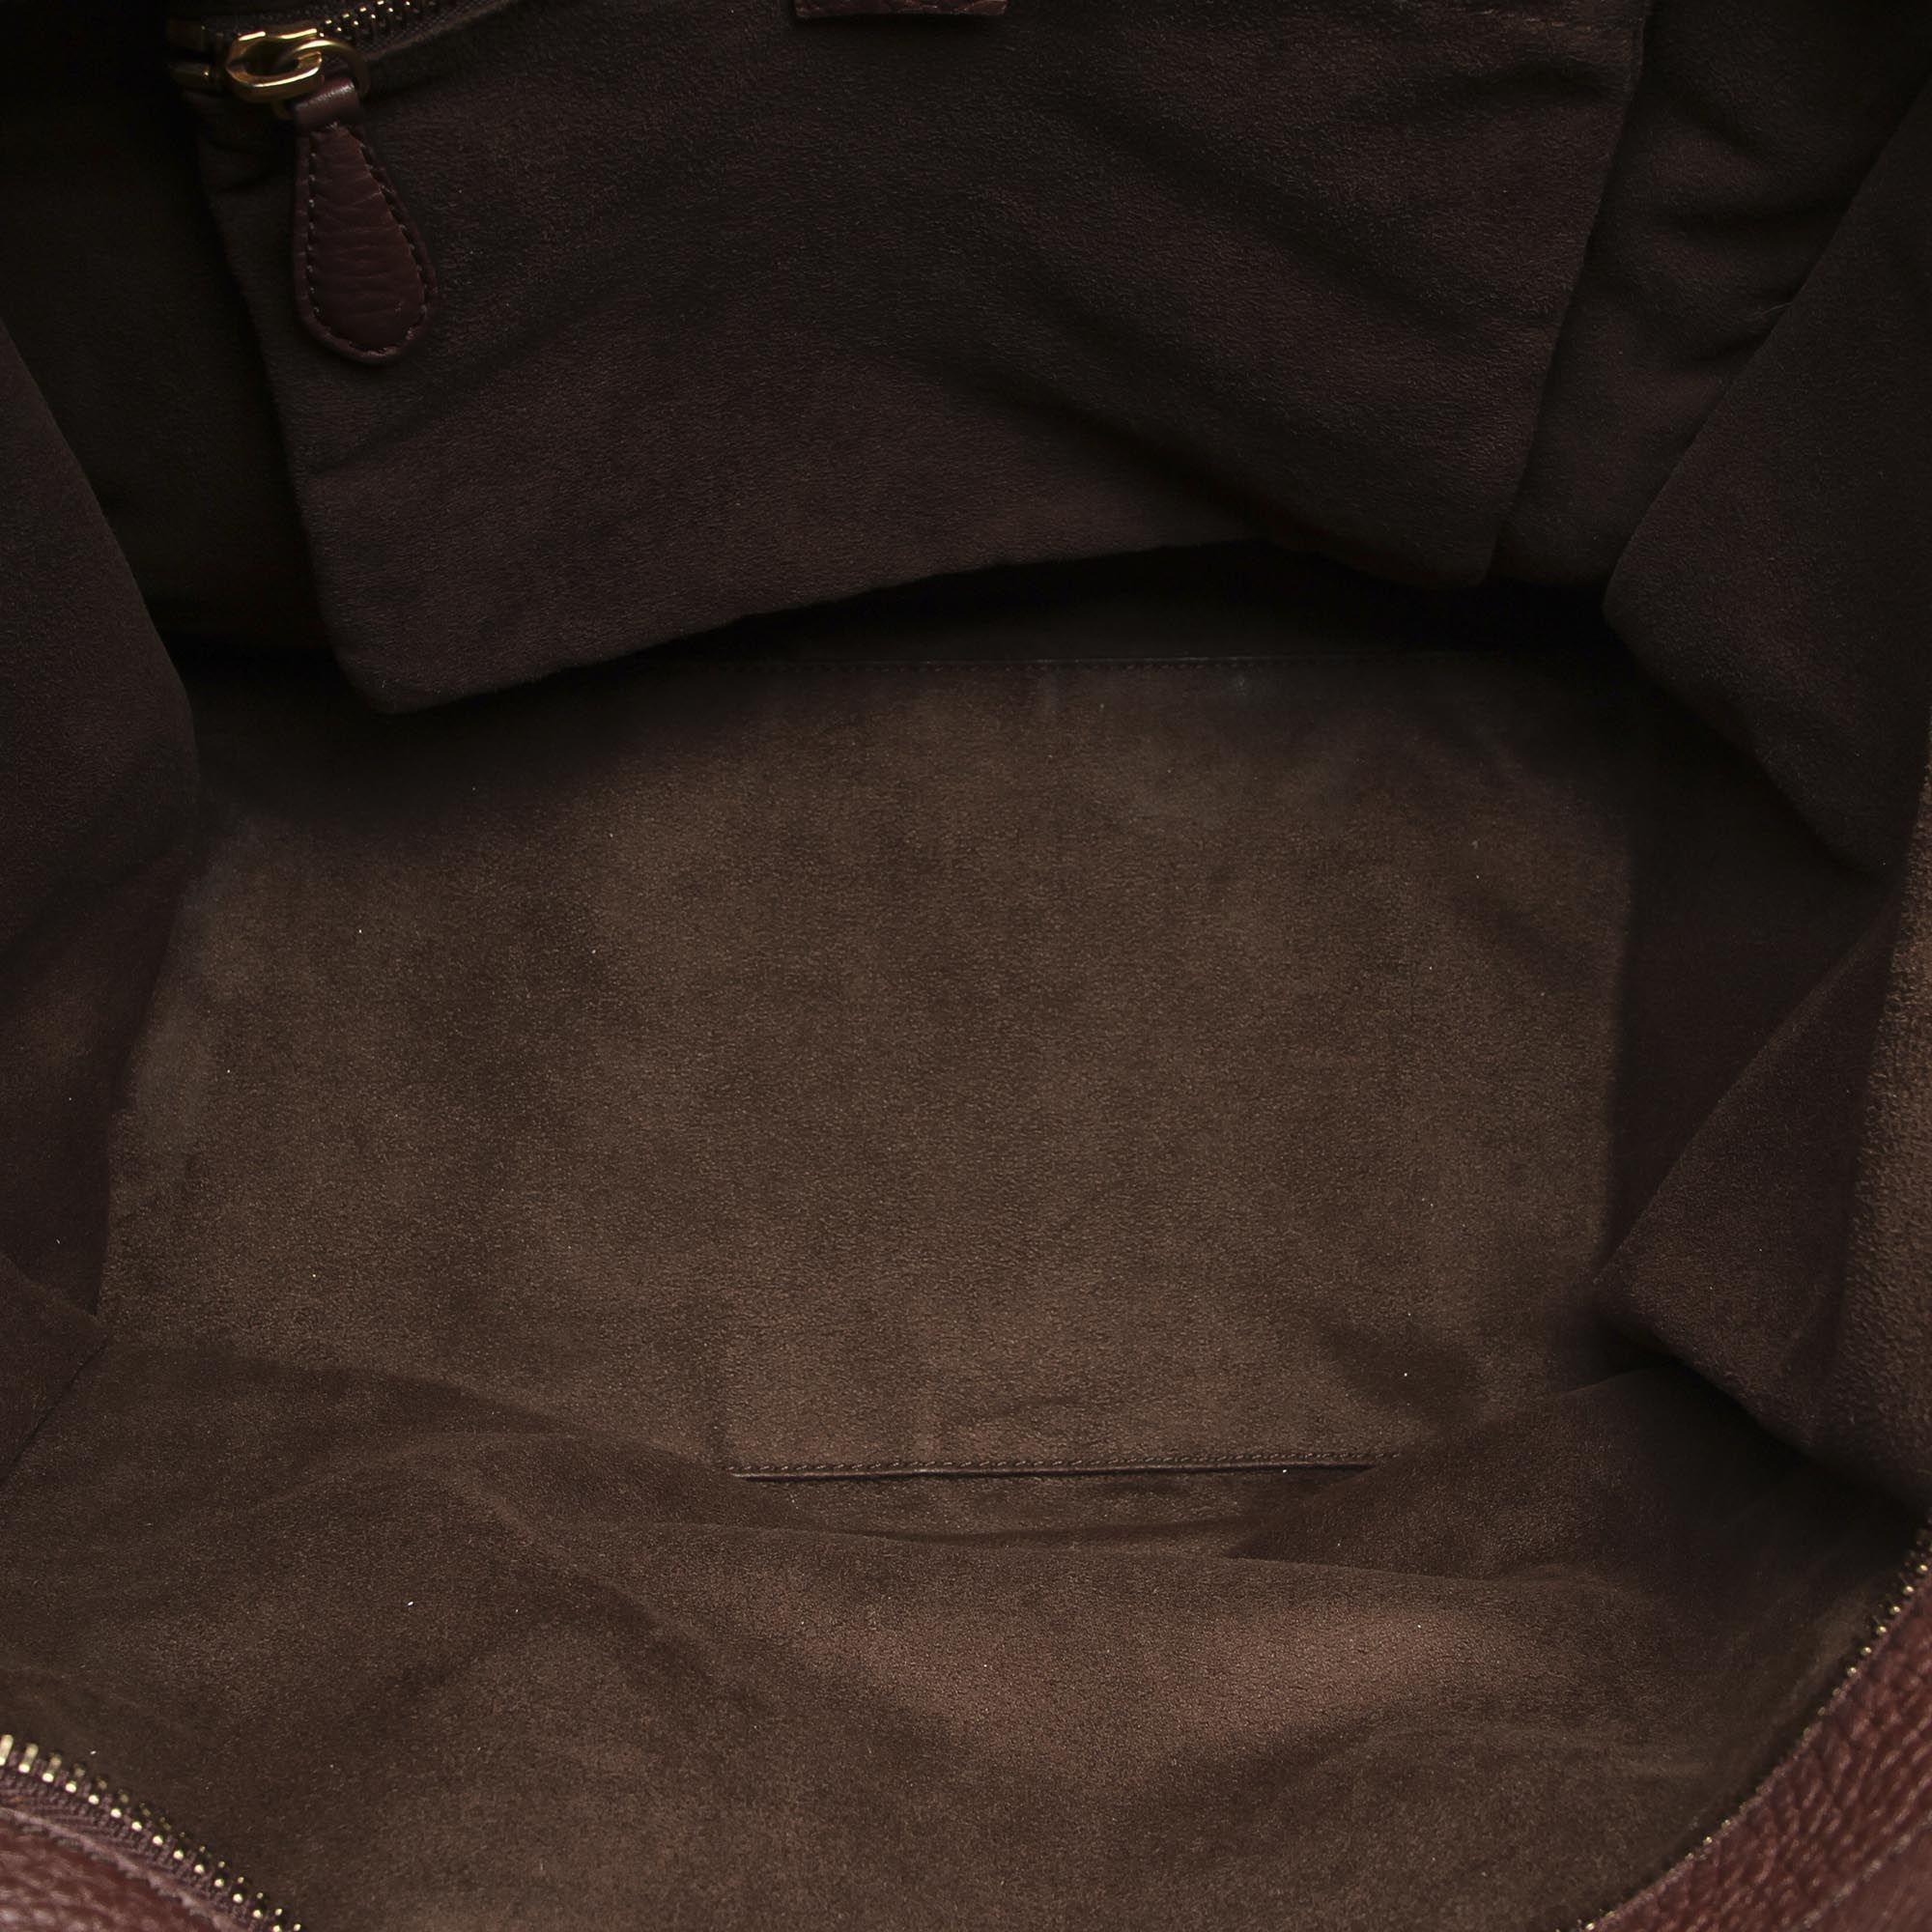 Vintage Celine The Luggage Tote Leather Tote Bag Brown